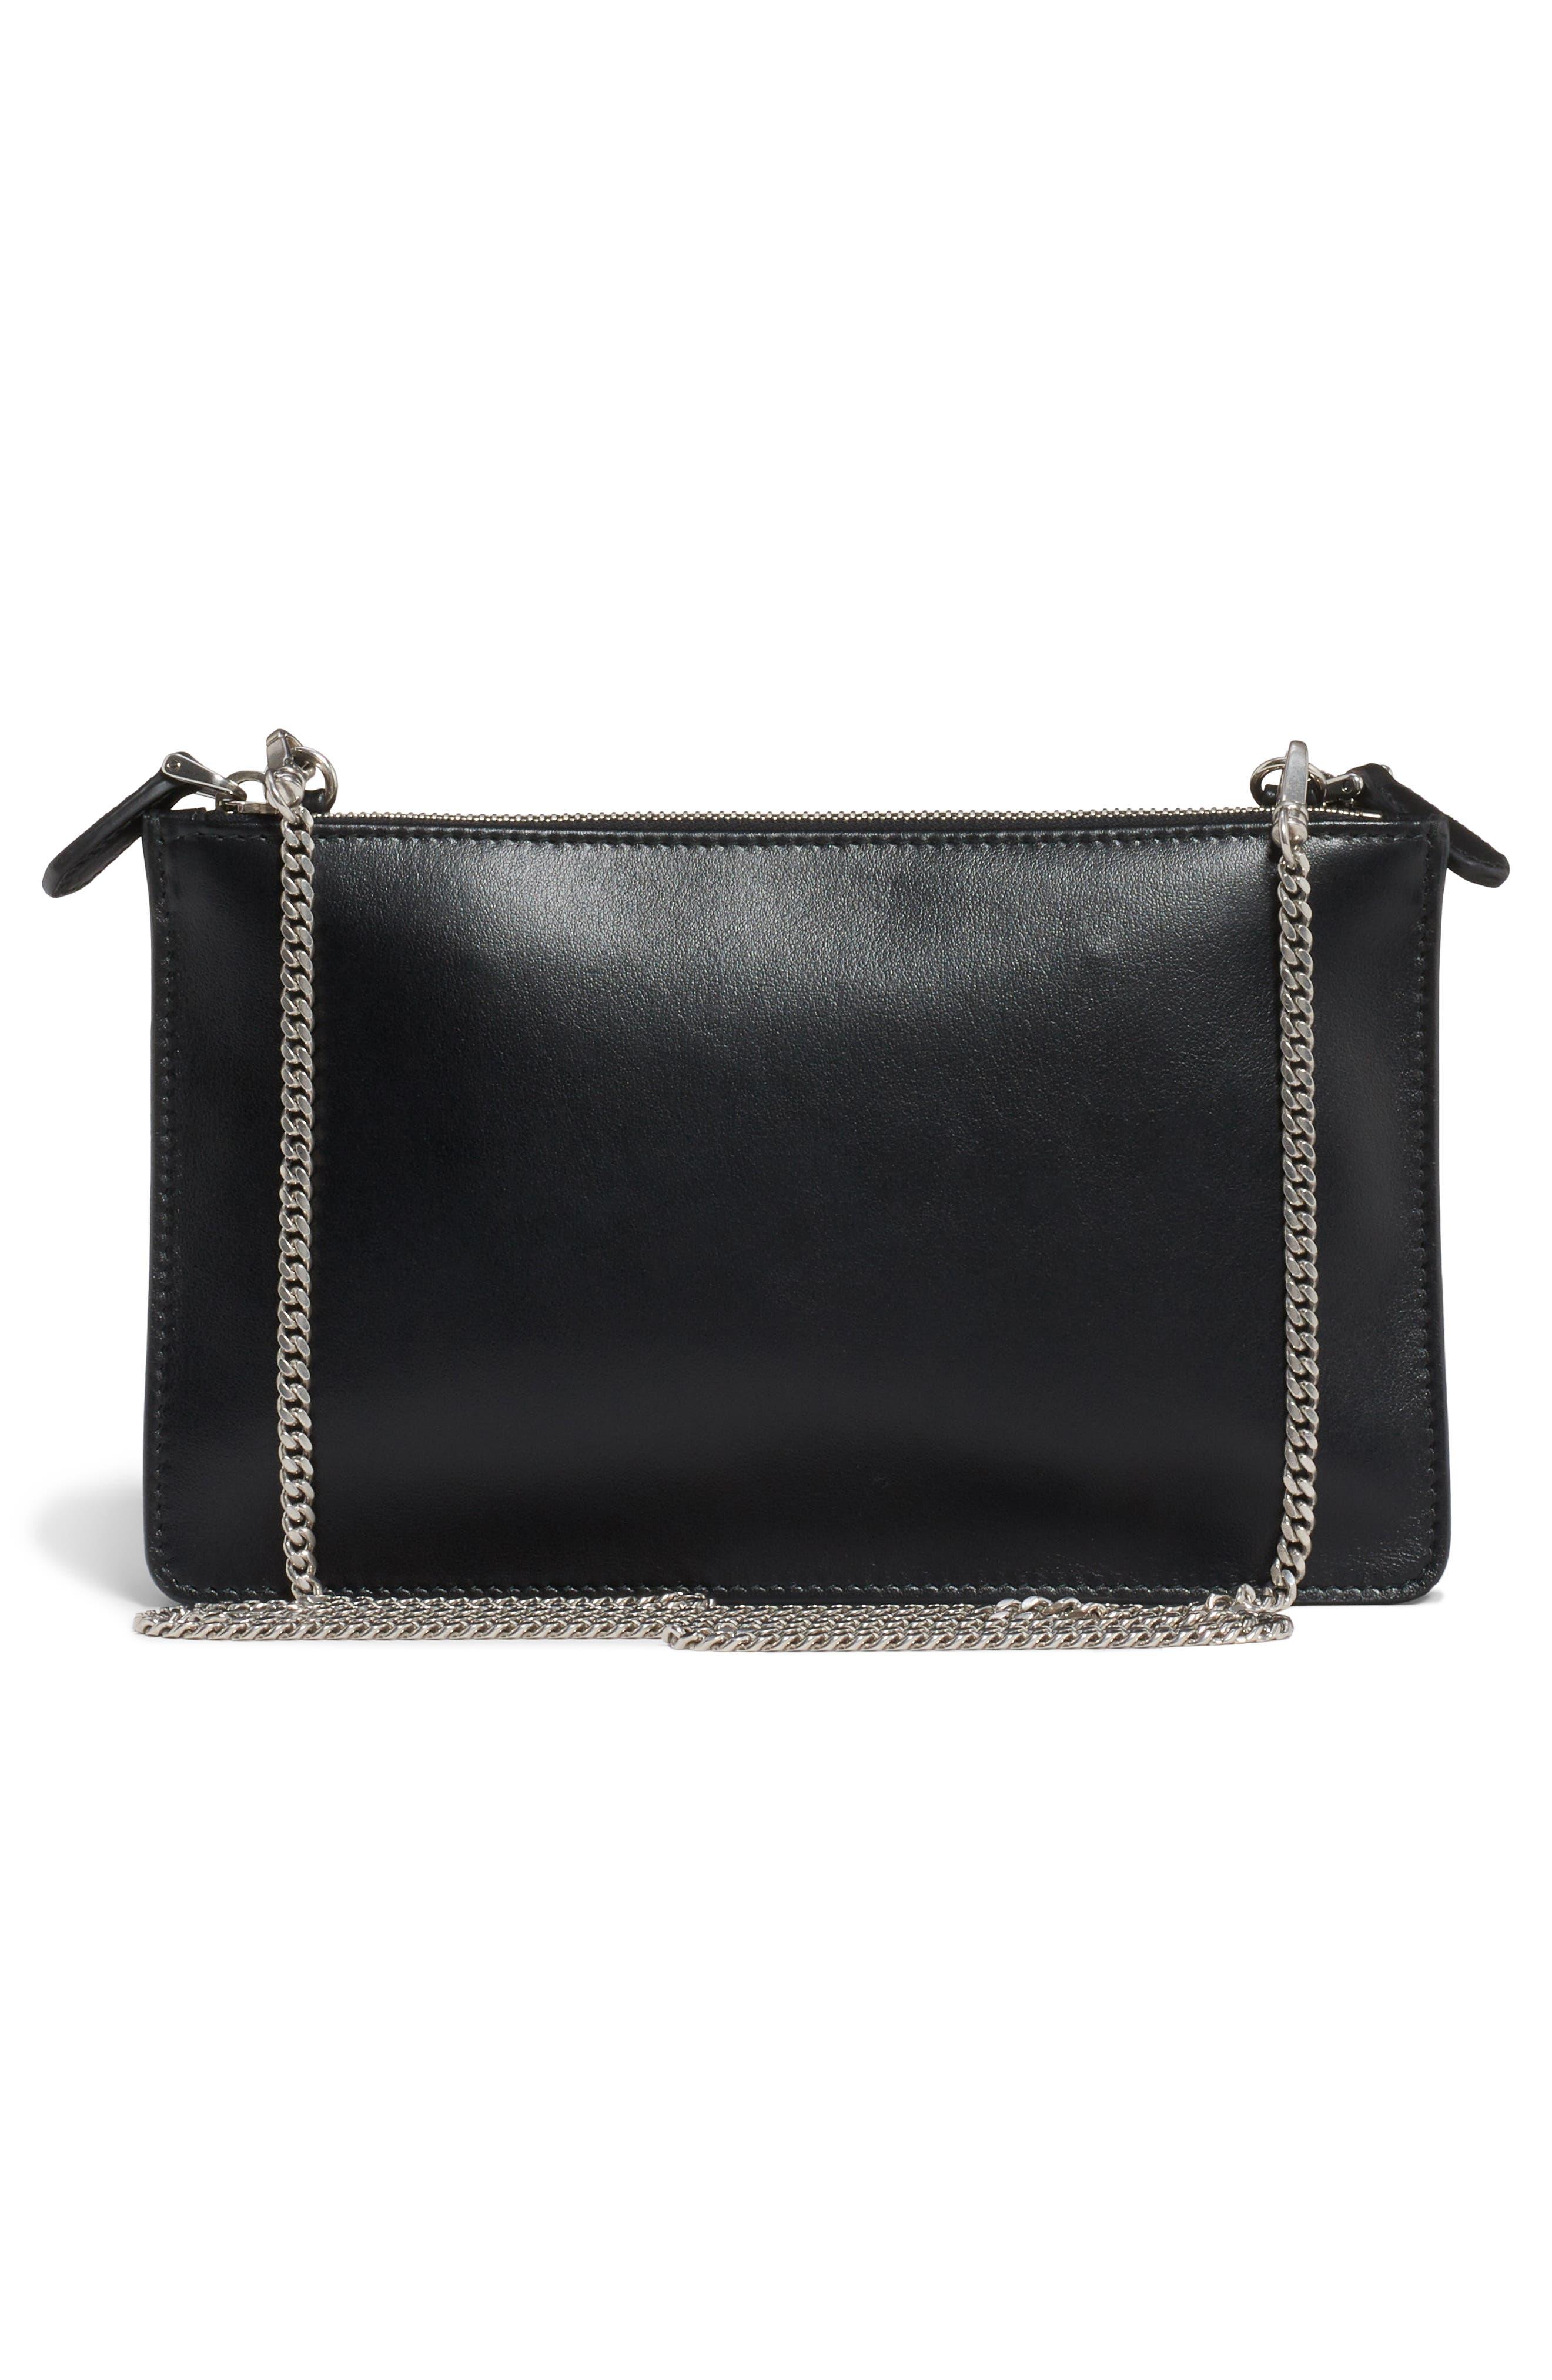 City Calfskin Leather Crossbody Bag,                             Alternate thumbnail 2, color,                             001